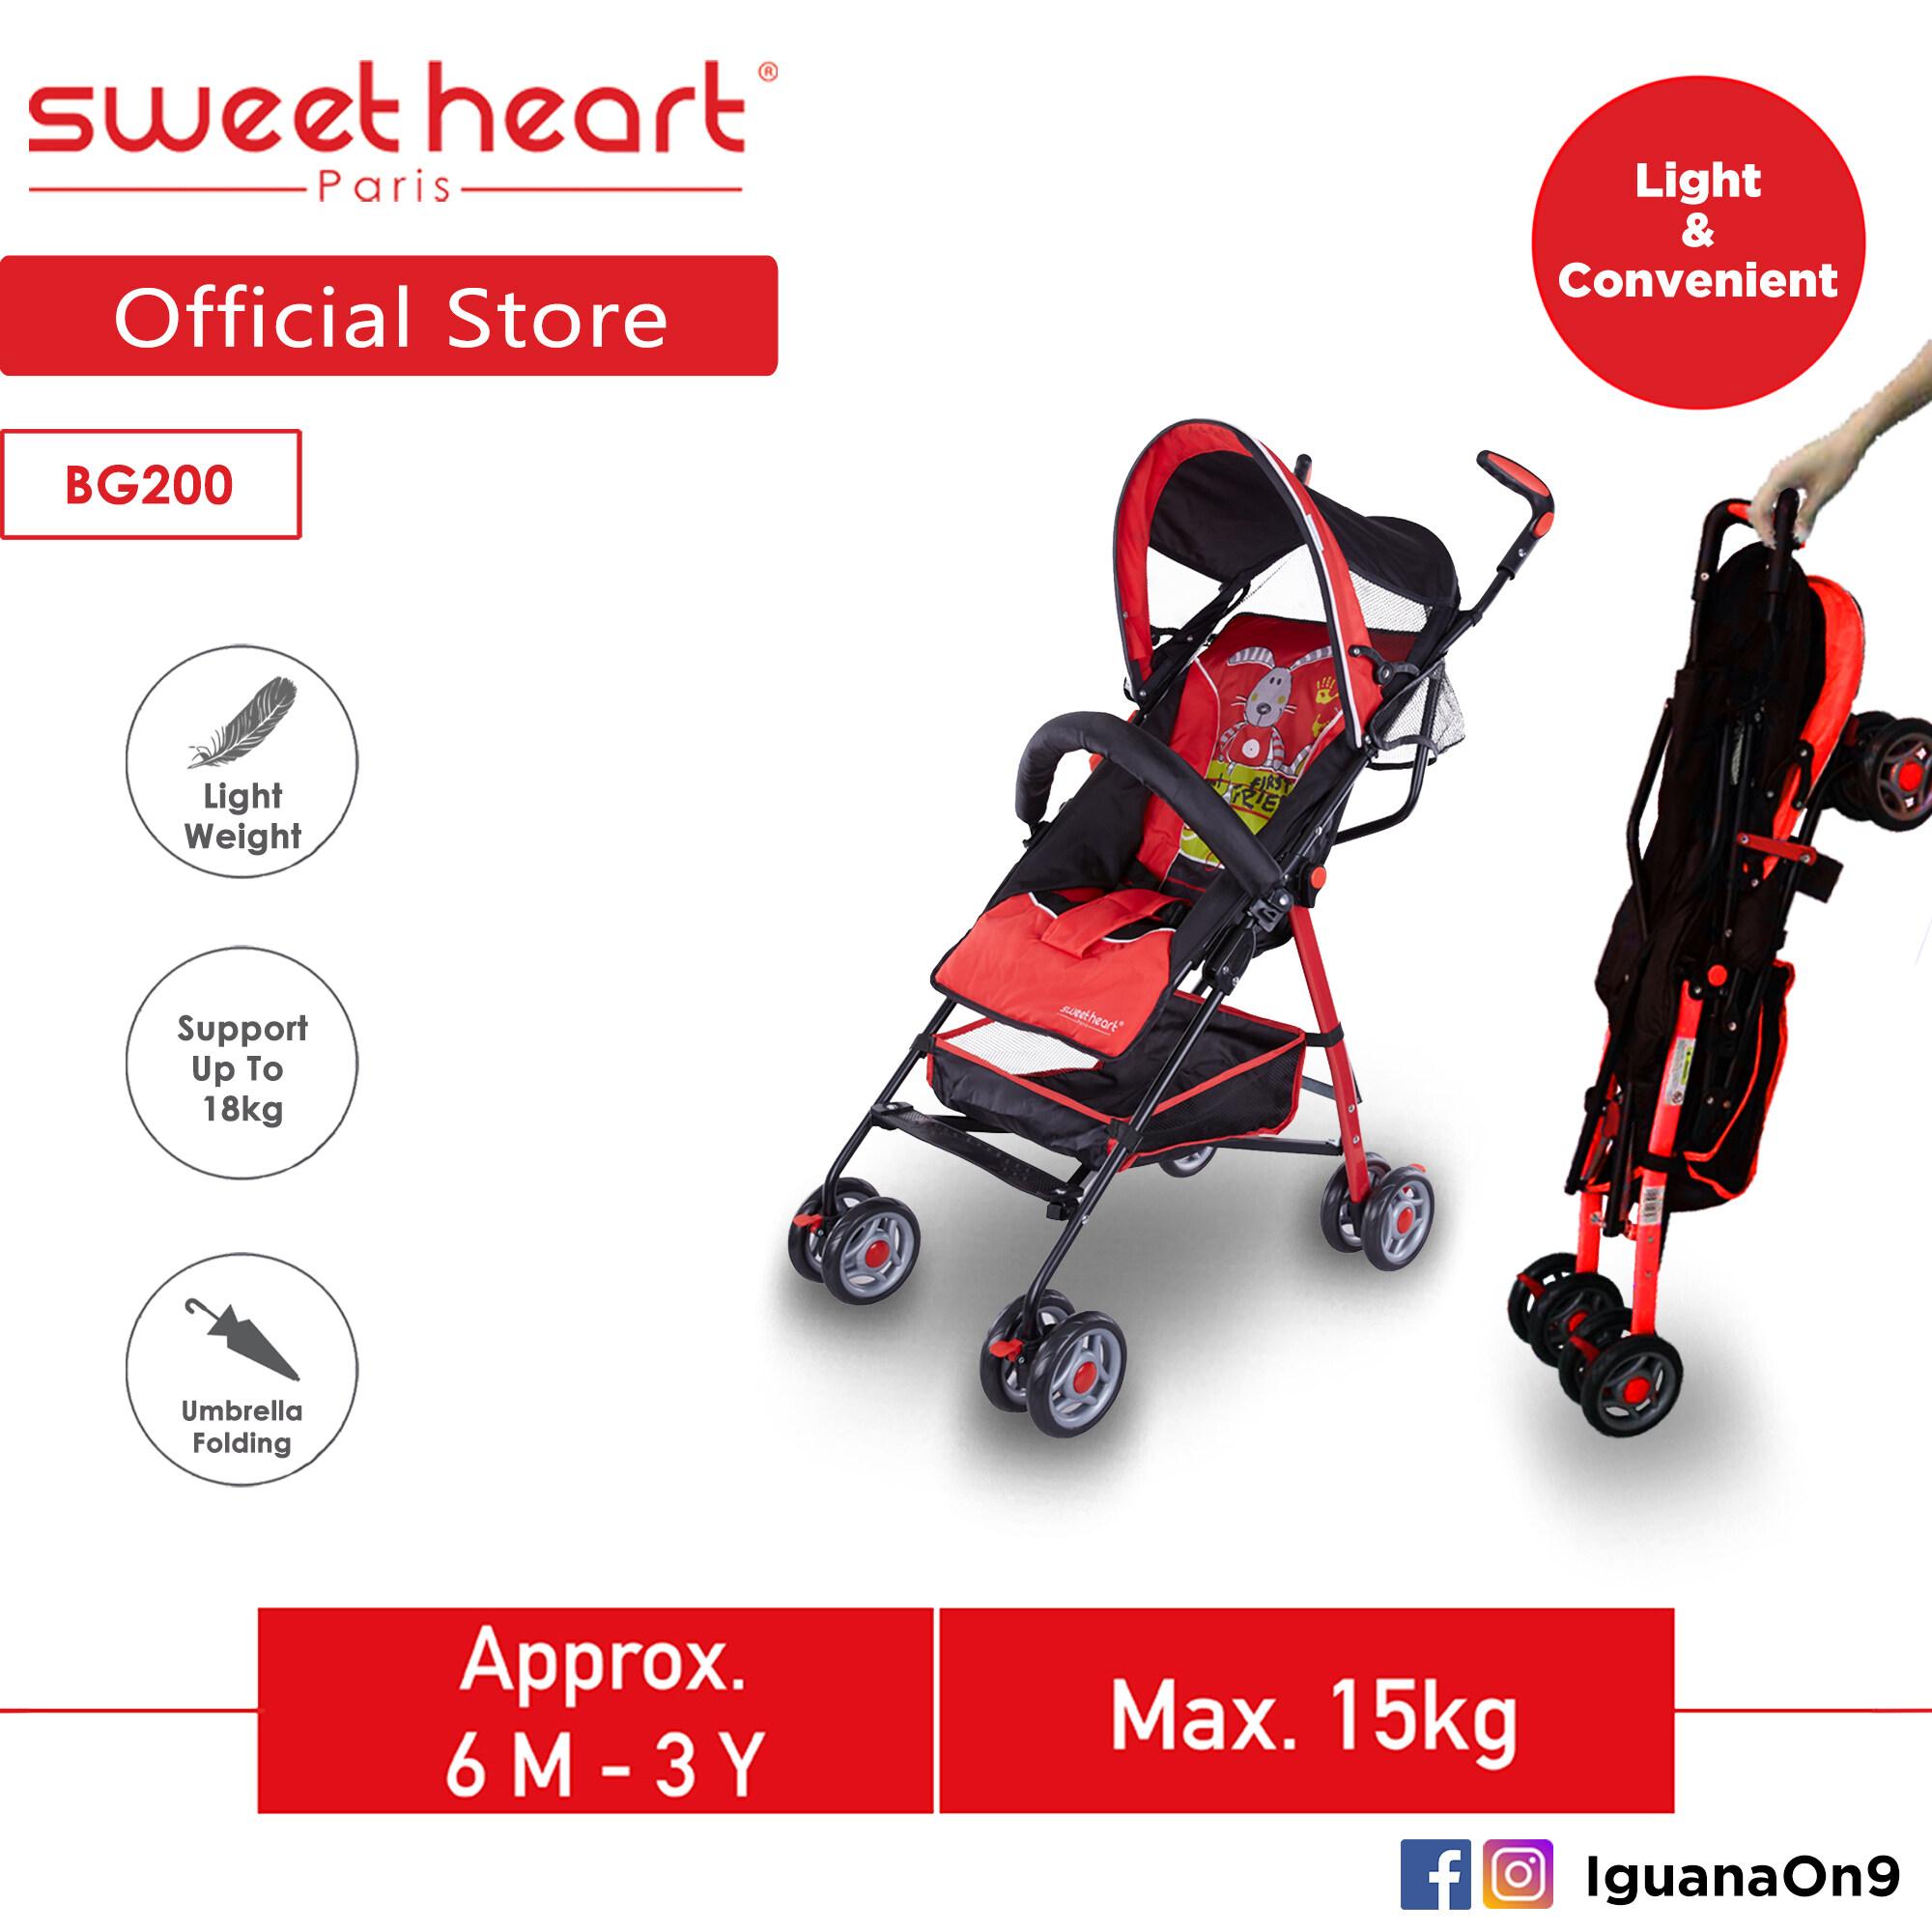 Sweet Heart Paris BG200 Umbrella Stroller Buggy (Red) with Steel Frame & Back-Rest Reclining